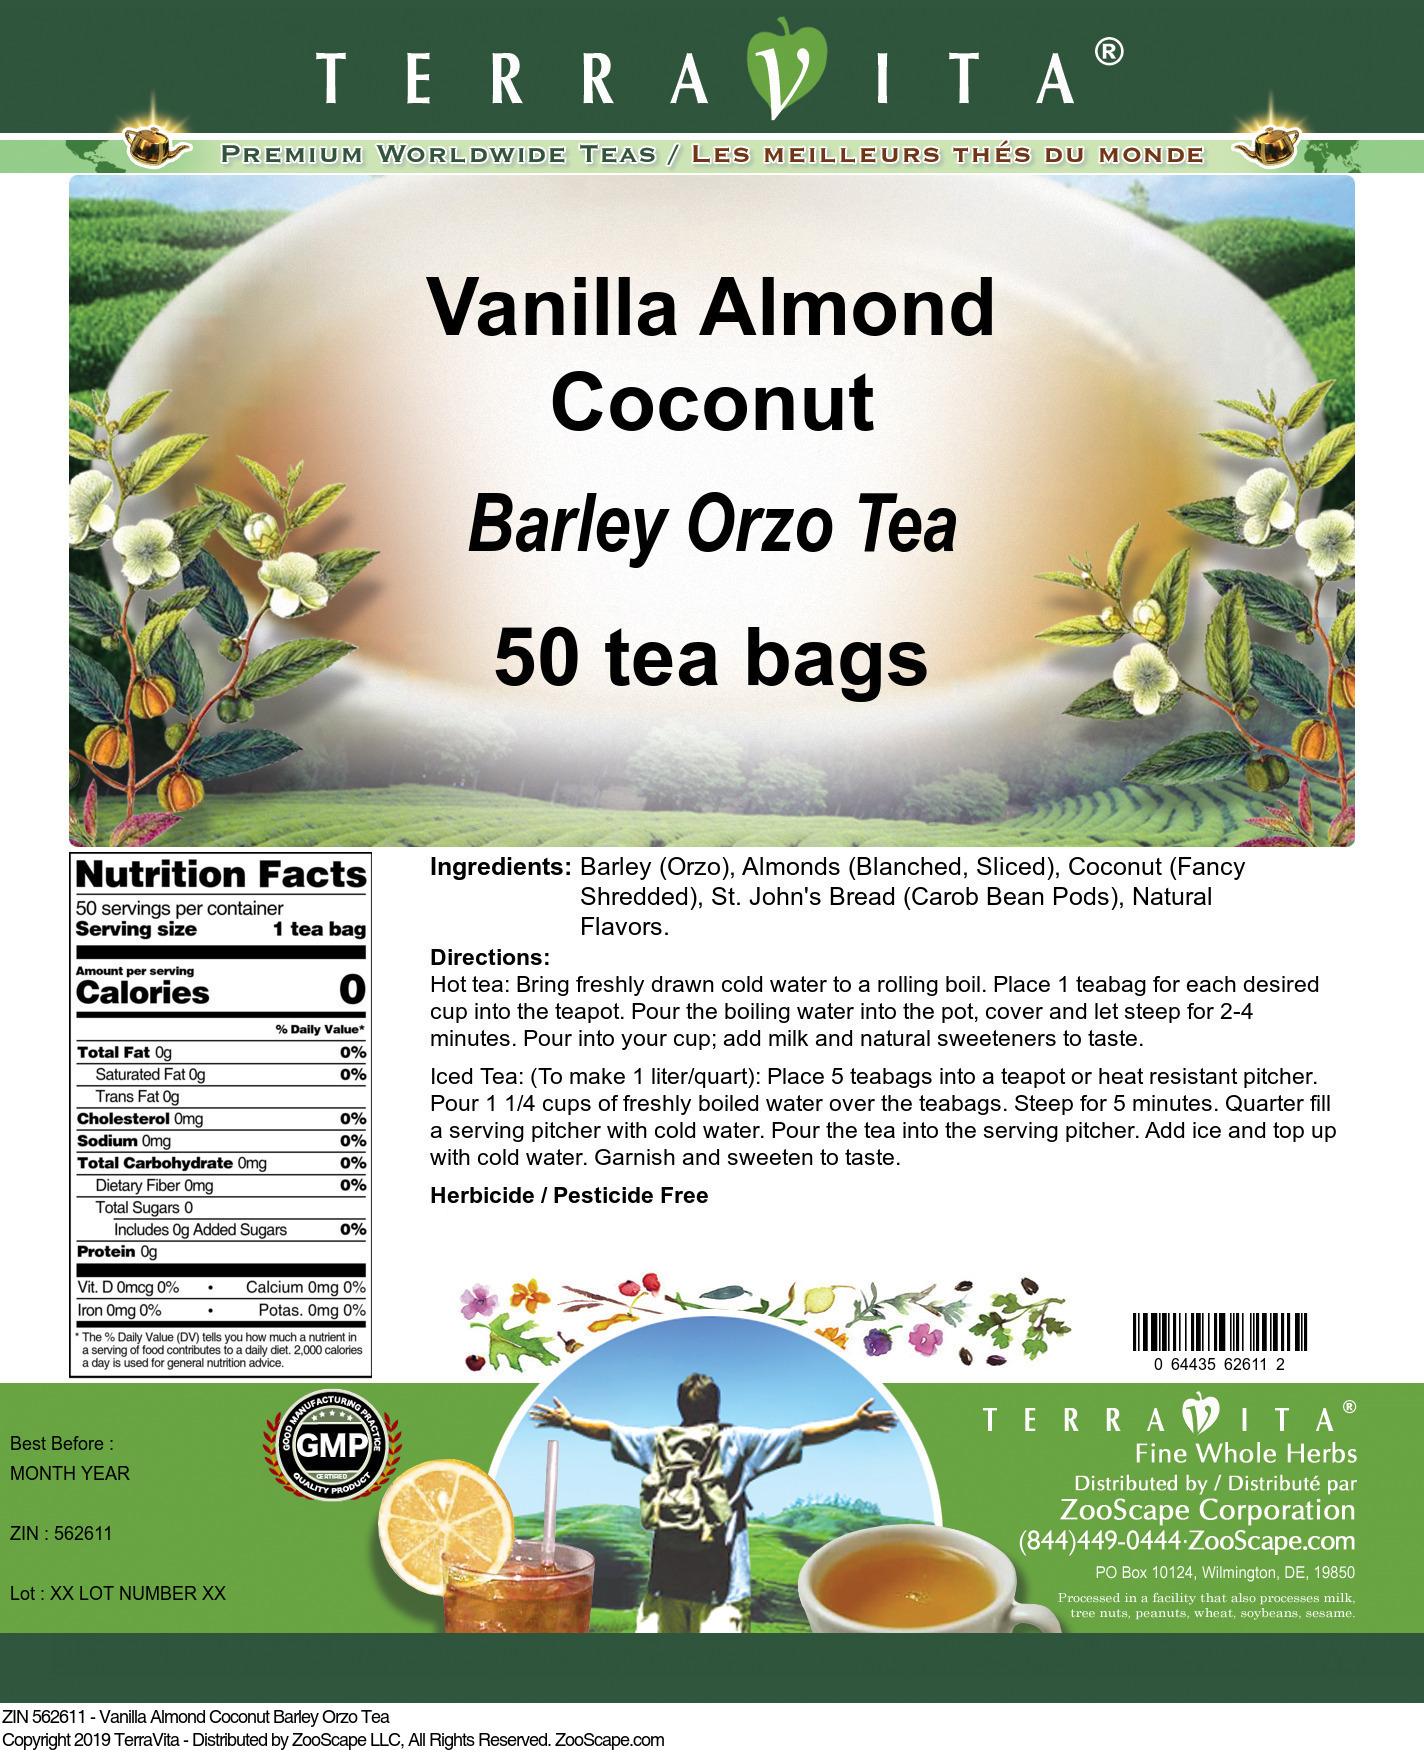 Vanilla Almond Coconut Barley Orzo Tea